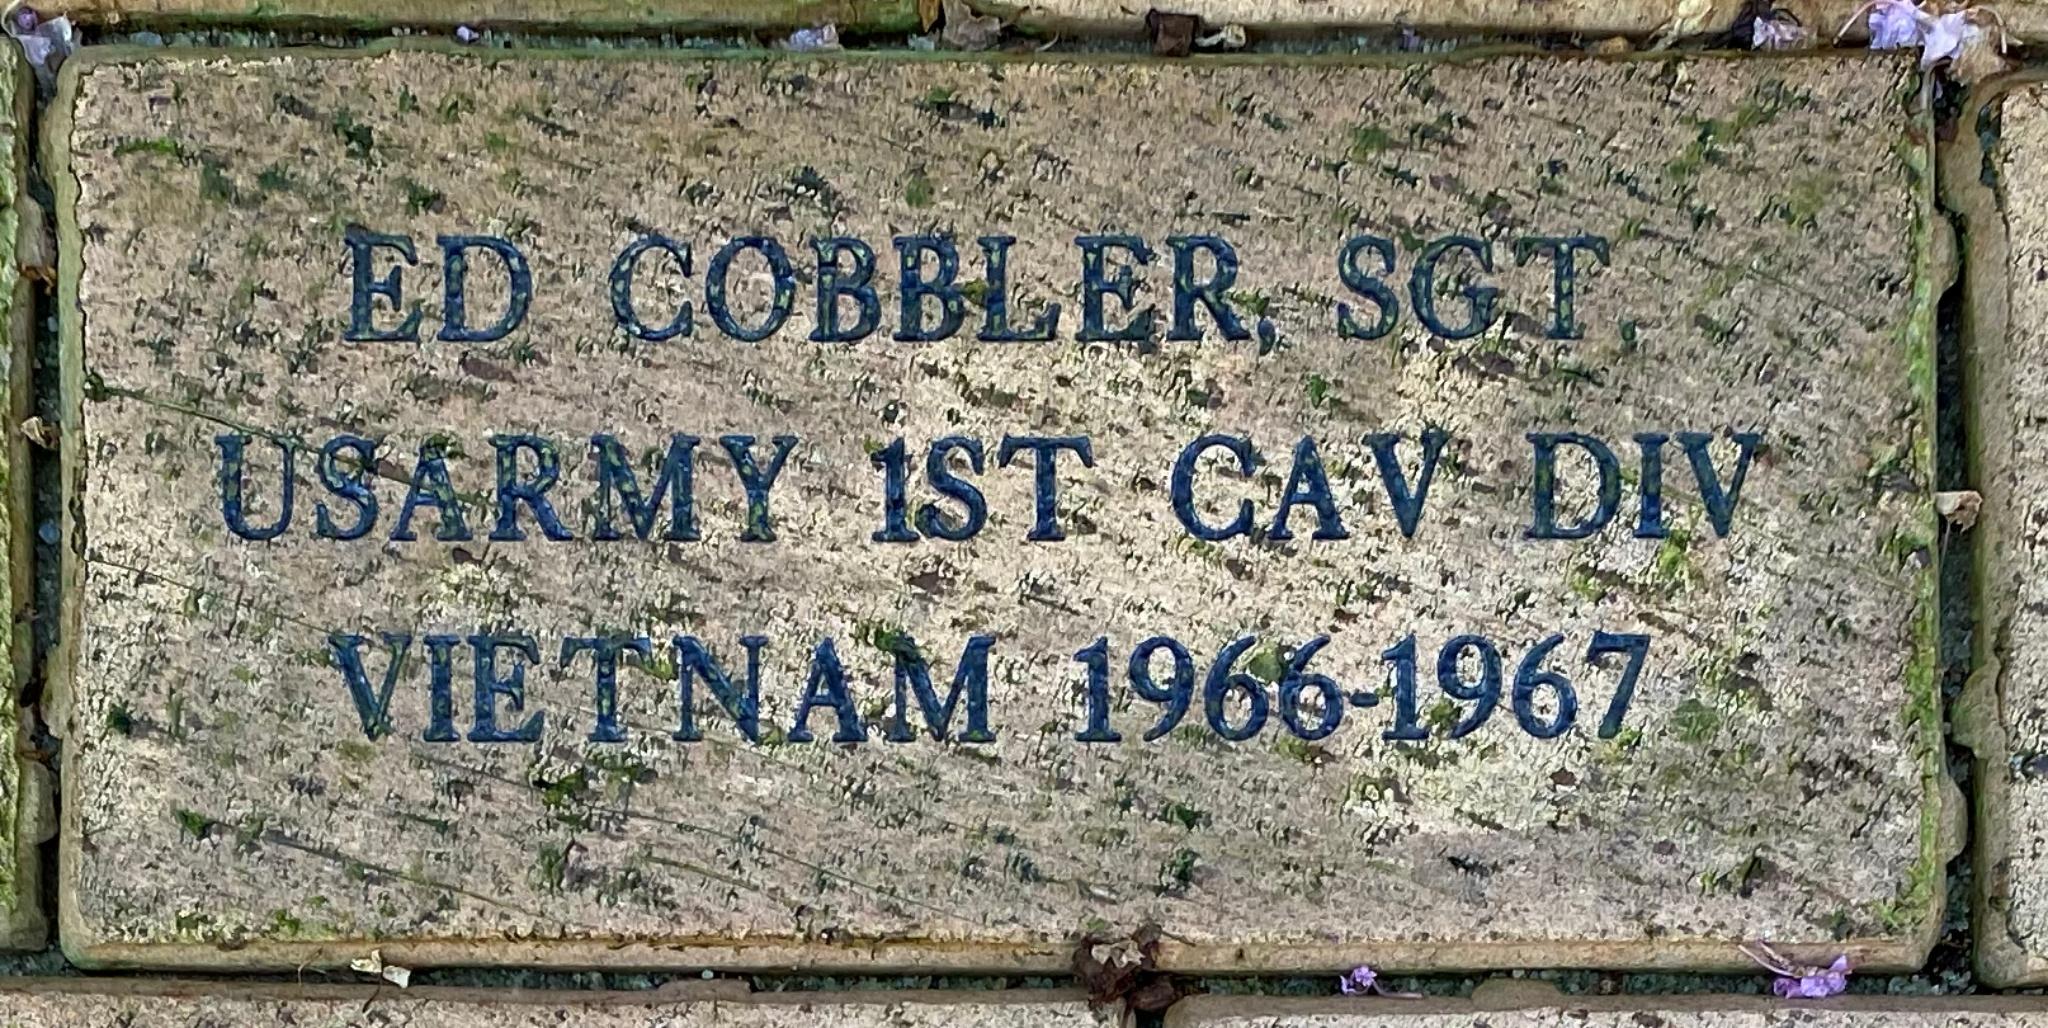 ED COBBLER, SGT USARMY 1ST CAV DIV VIETNAM 1966-1967